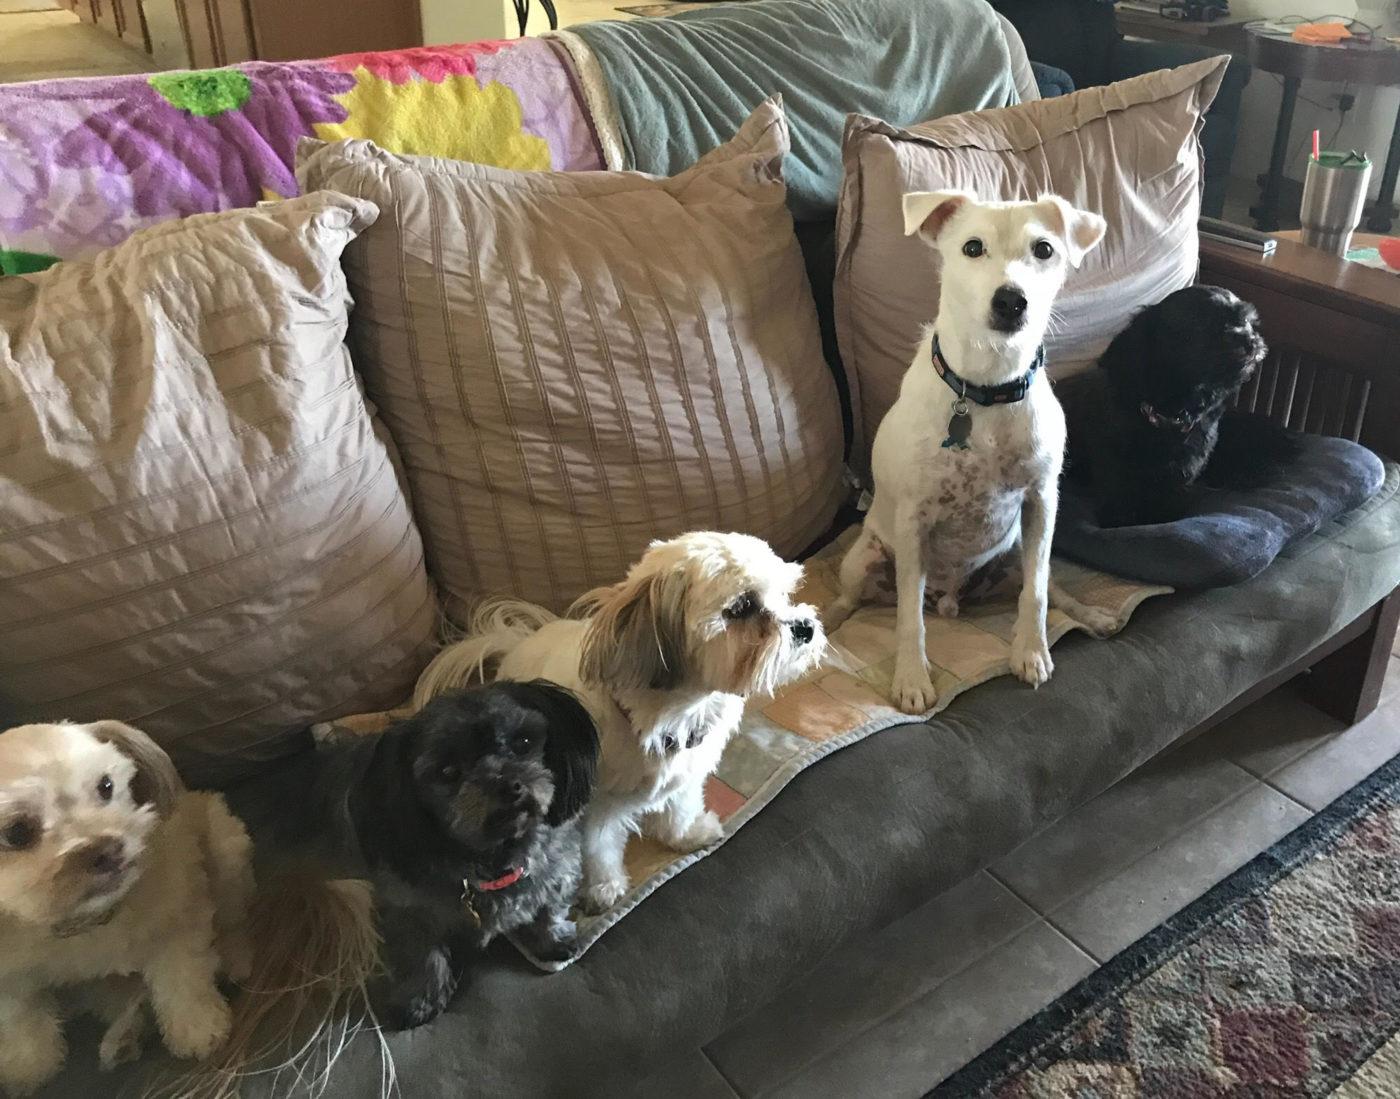 #jackrussellterrierdogtraining #dogsofbarkbusters #housebreaking #dogtrainingavondale